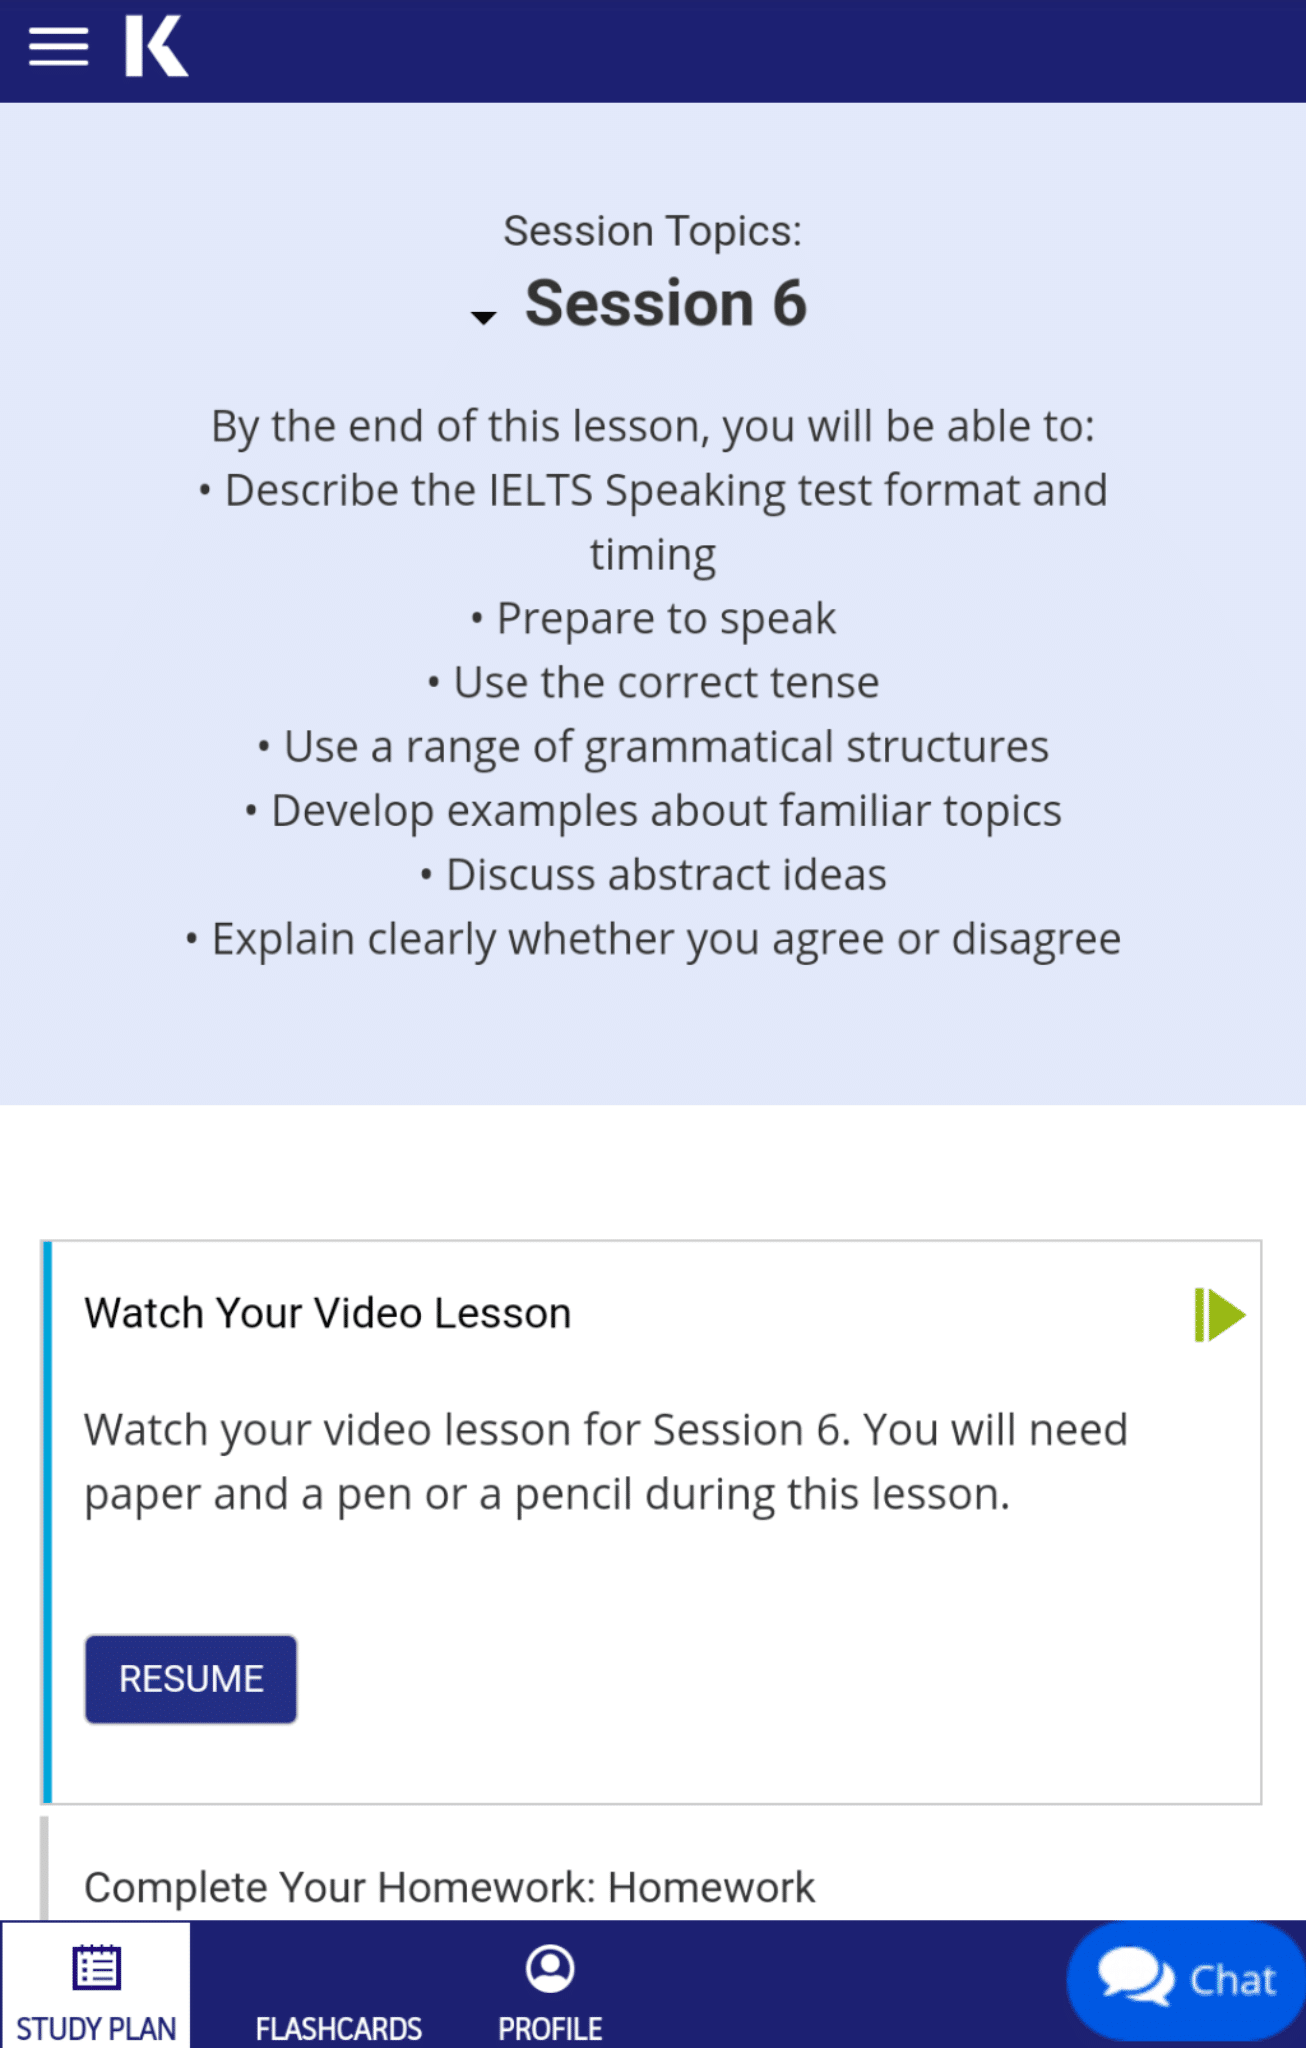 Kaplan IELTS session